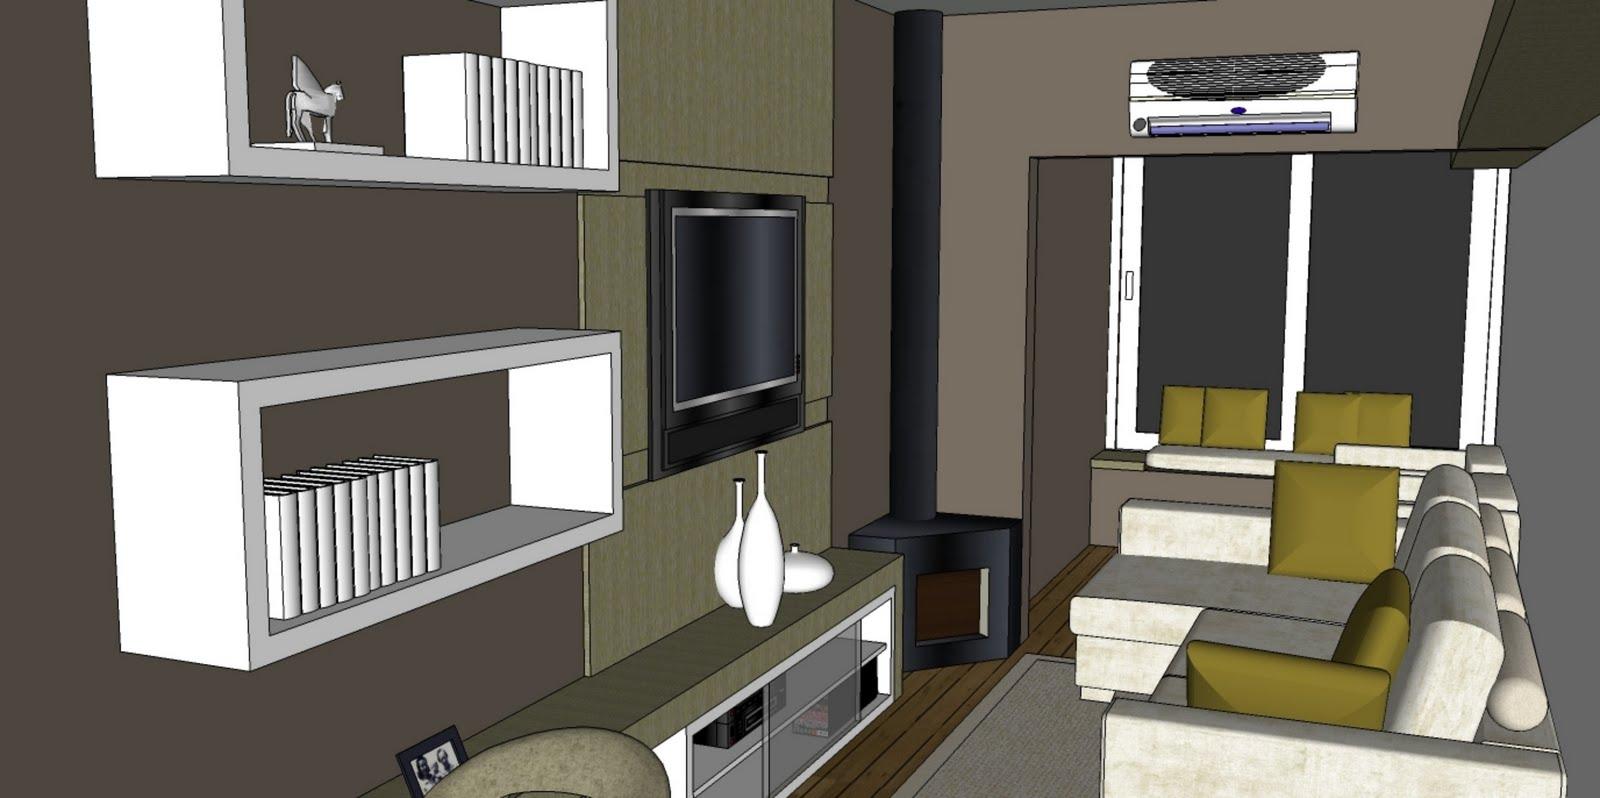 embase arquitetura para projetos de vida: apartamento ed. guarany #6D6744 1600 798